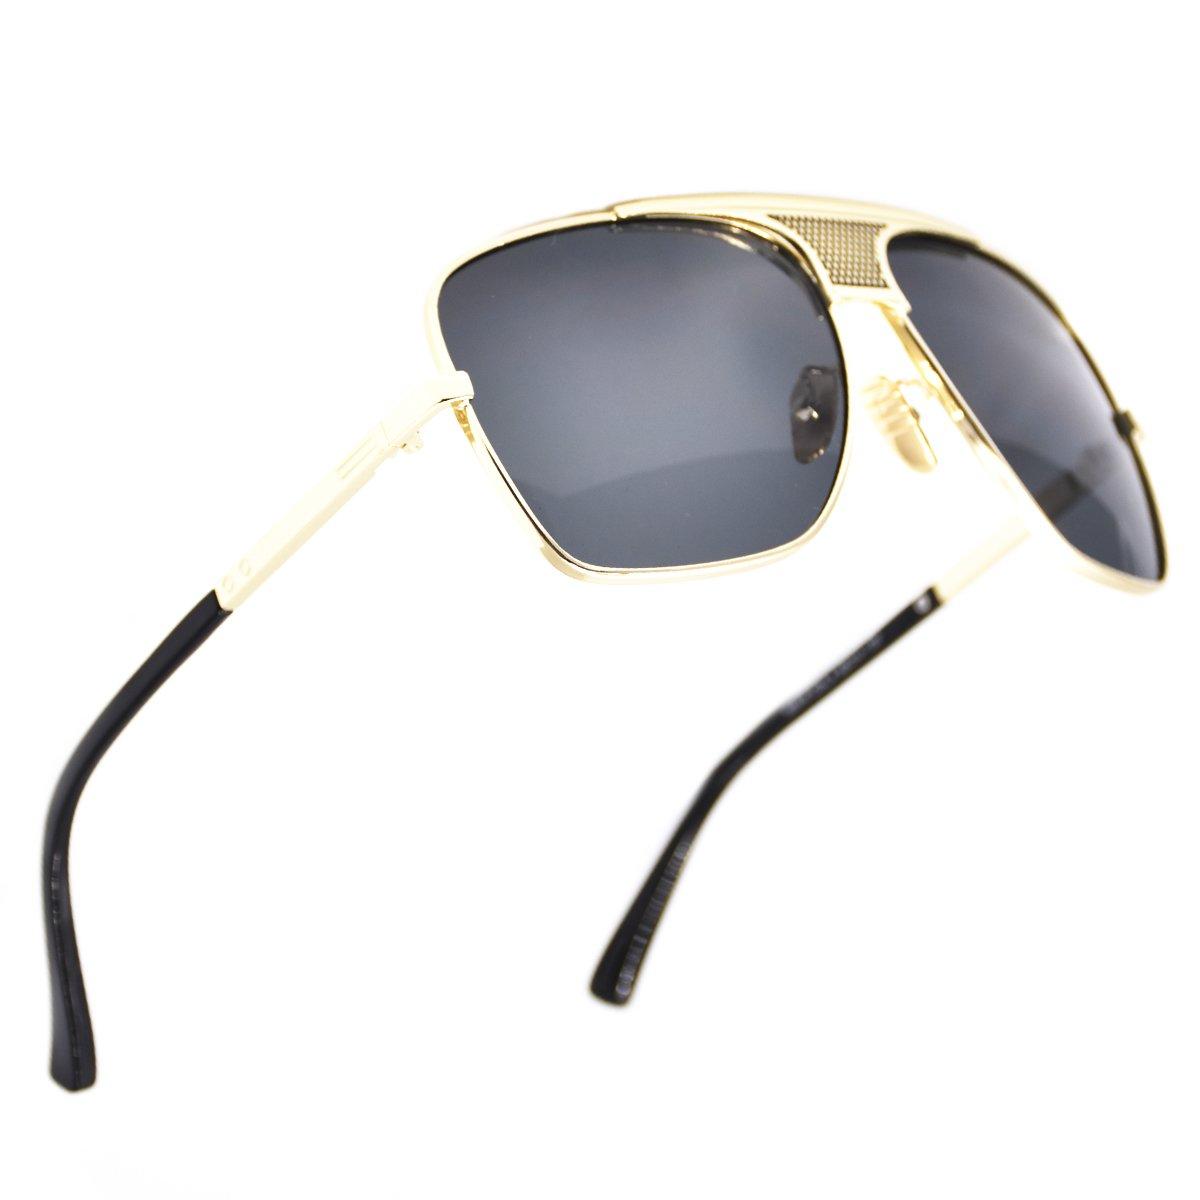 05ea30440 Amazon.com: SamuRita Metal Celebrity Flat Top Aviator Sunglasses Oversized  Designer Shades(Black Lens/Gold Frame): Clothing